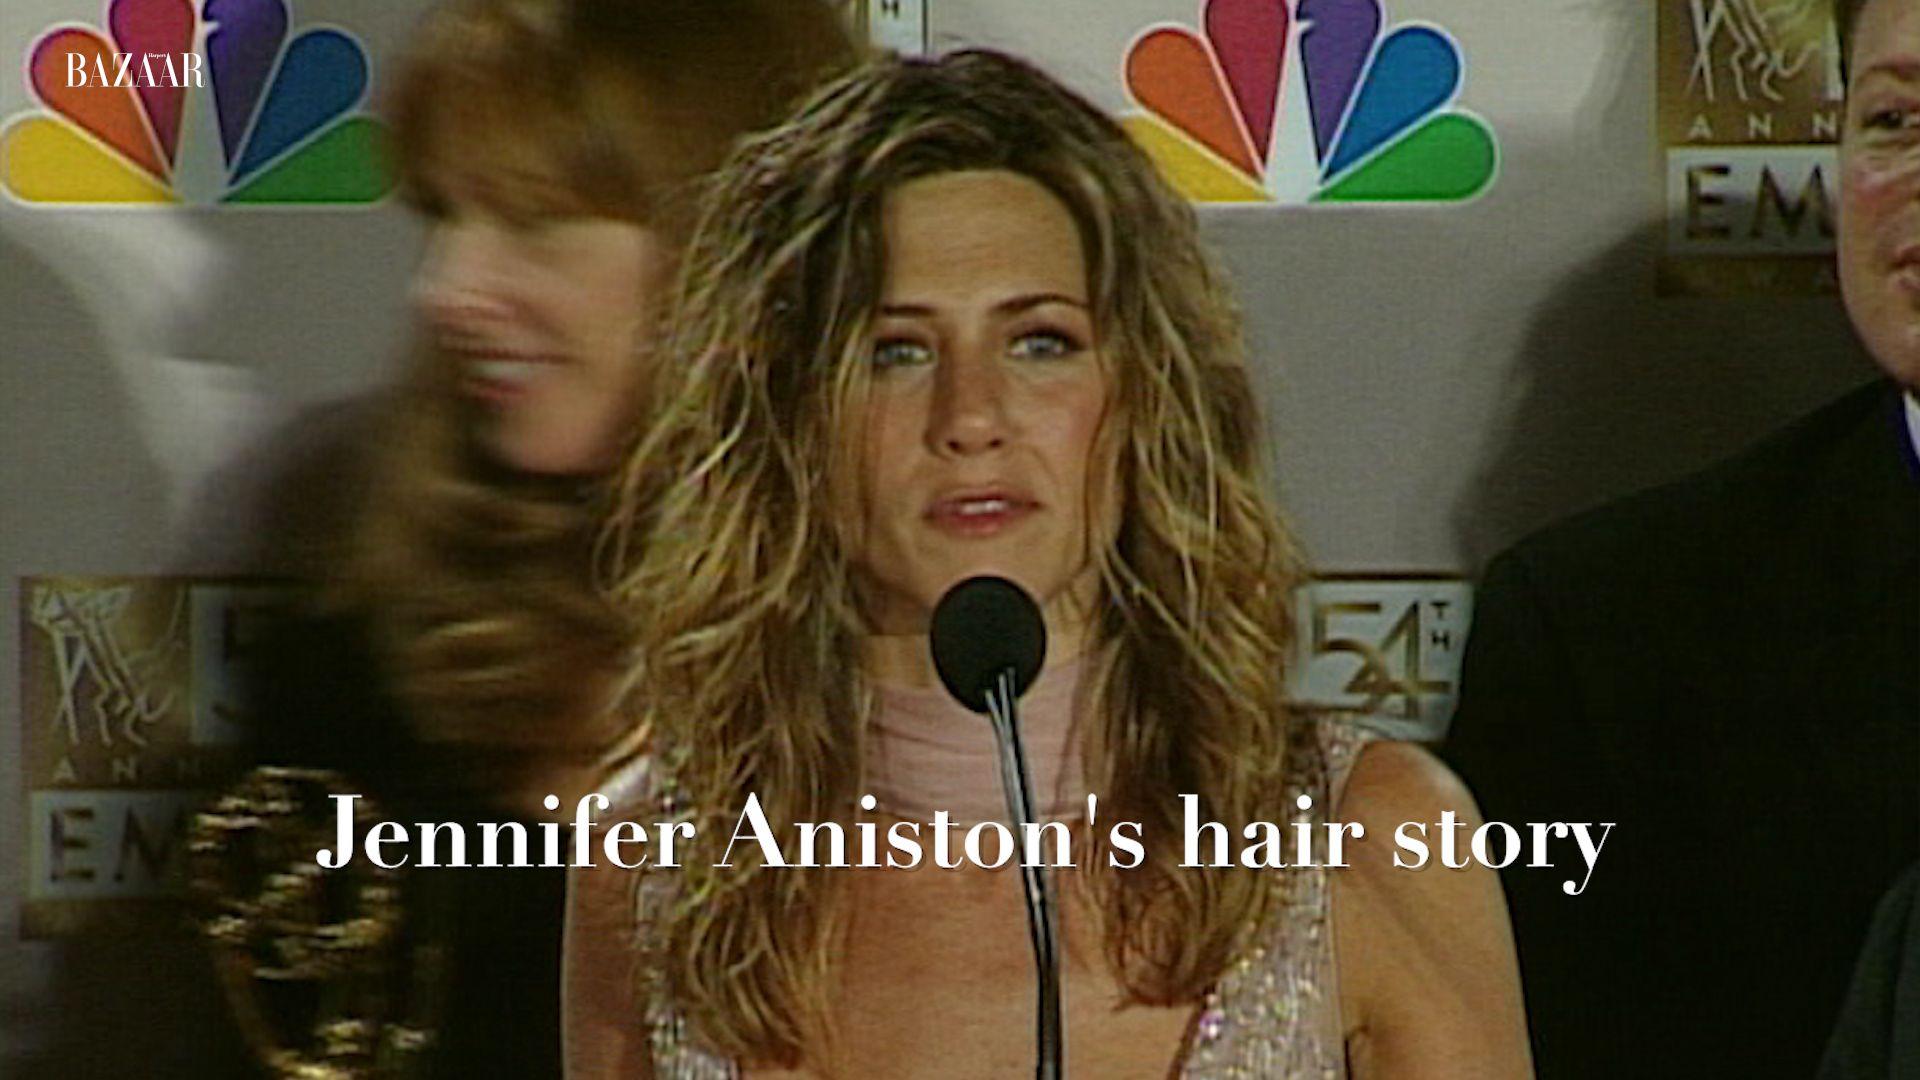 Jennifer Aniston's Skincare Routine Includes Sunday Spa Days And Decades Of Moisturizer